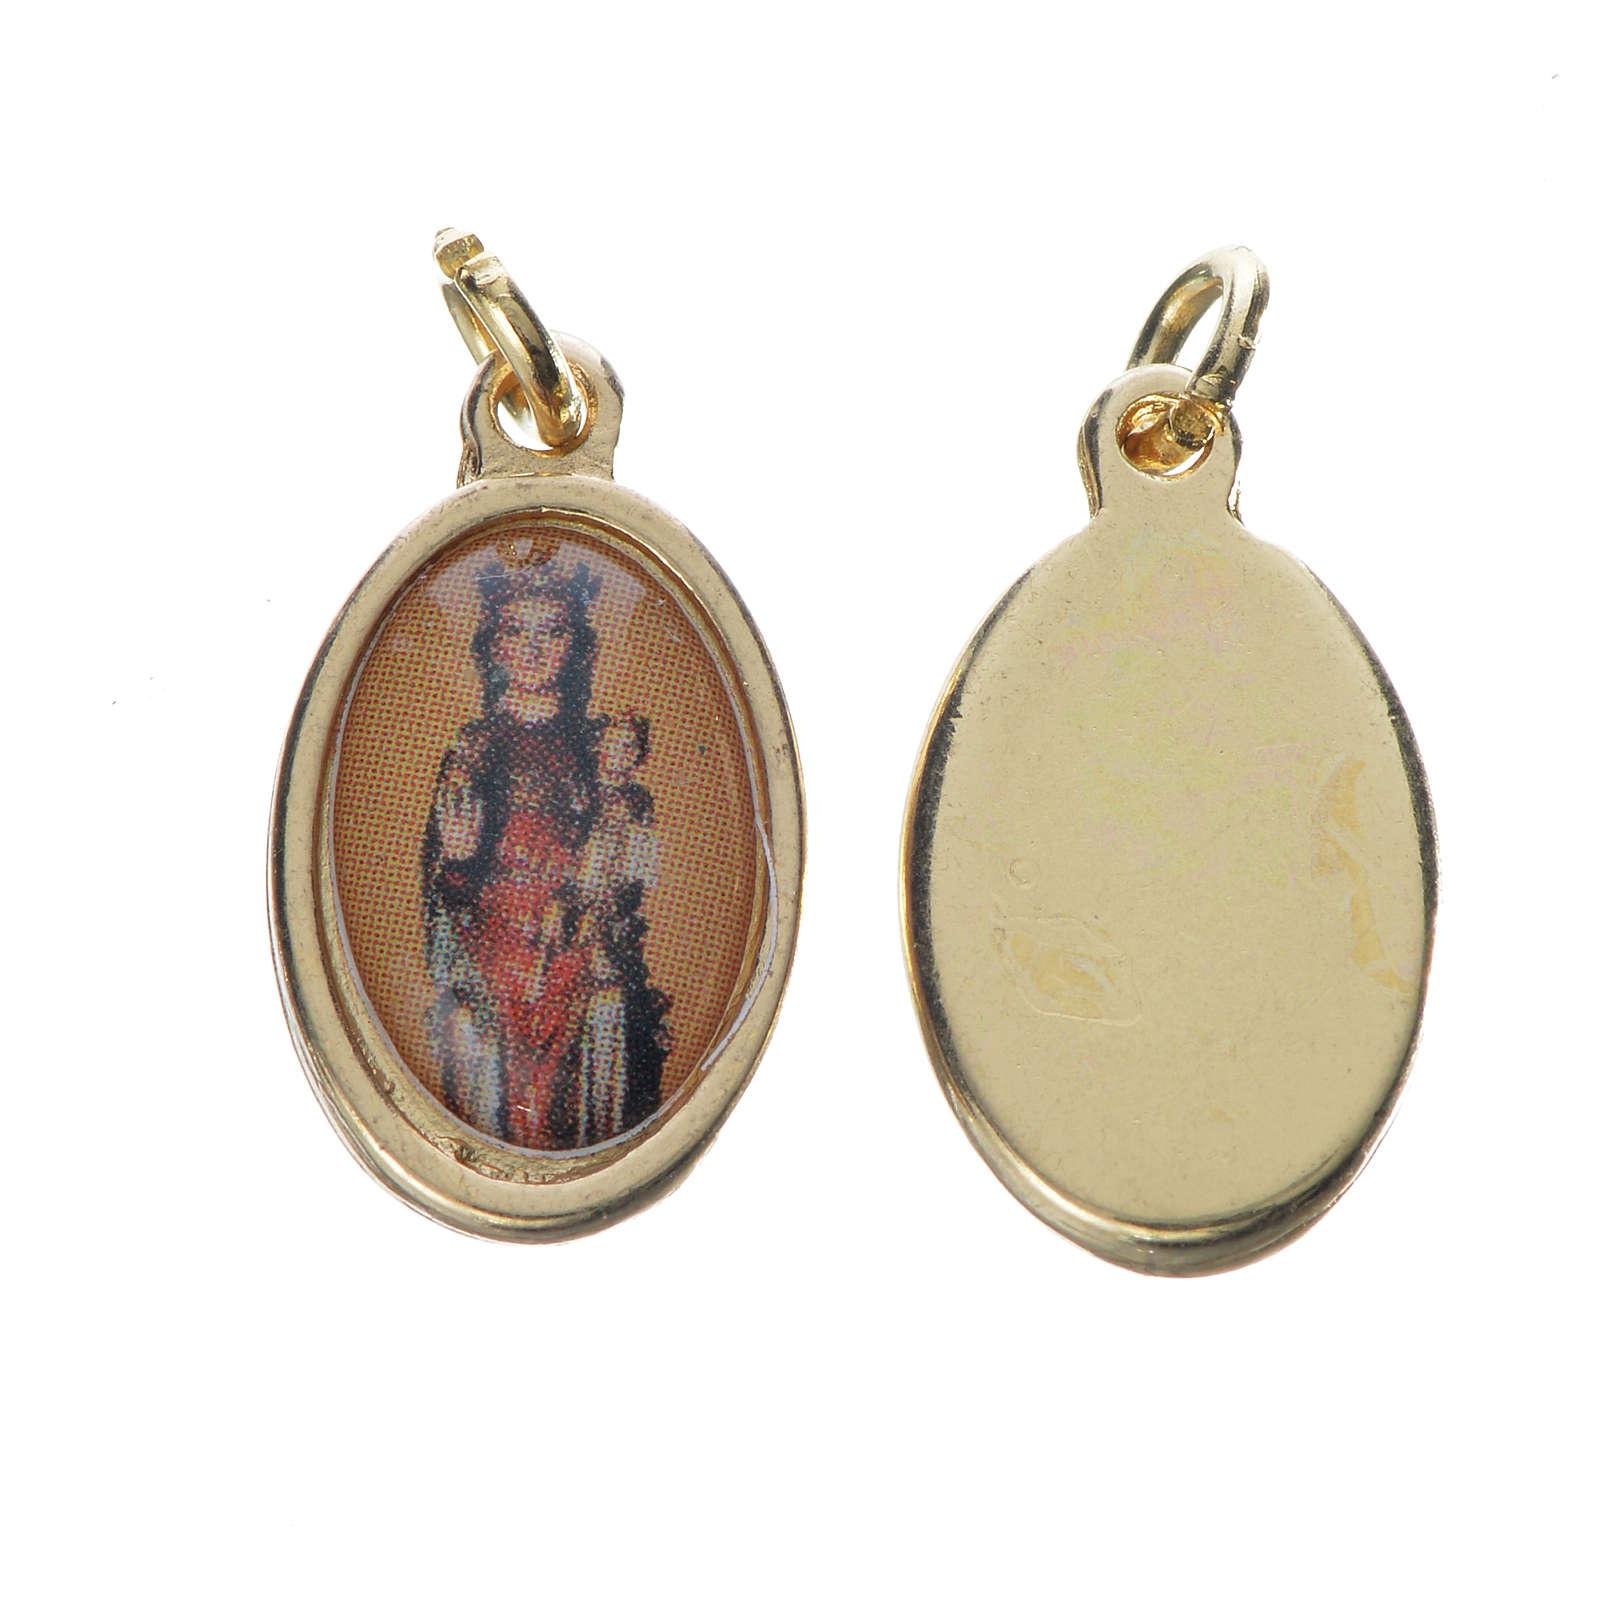 Notre Dame de Fenestre medal in golden metal, 1.5cm 4